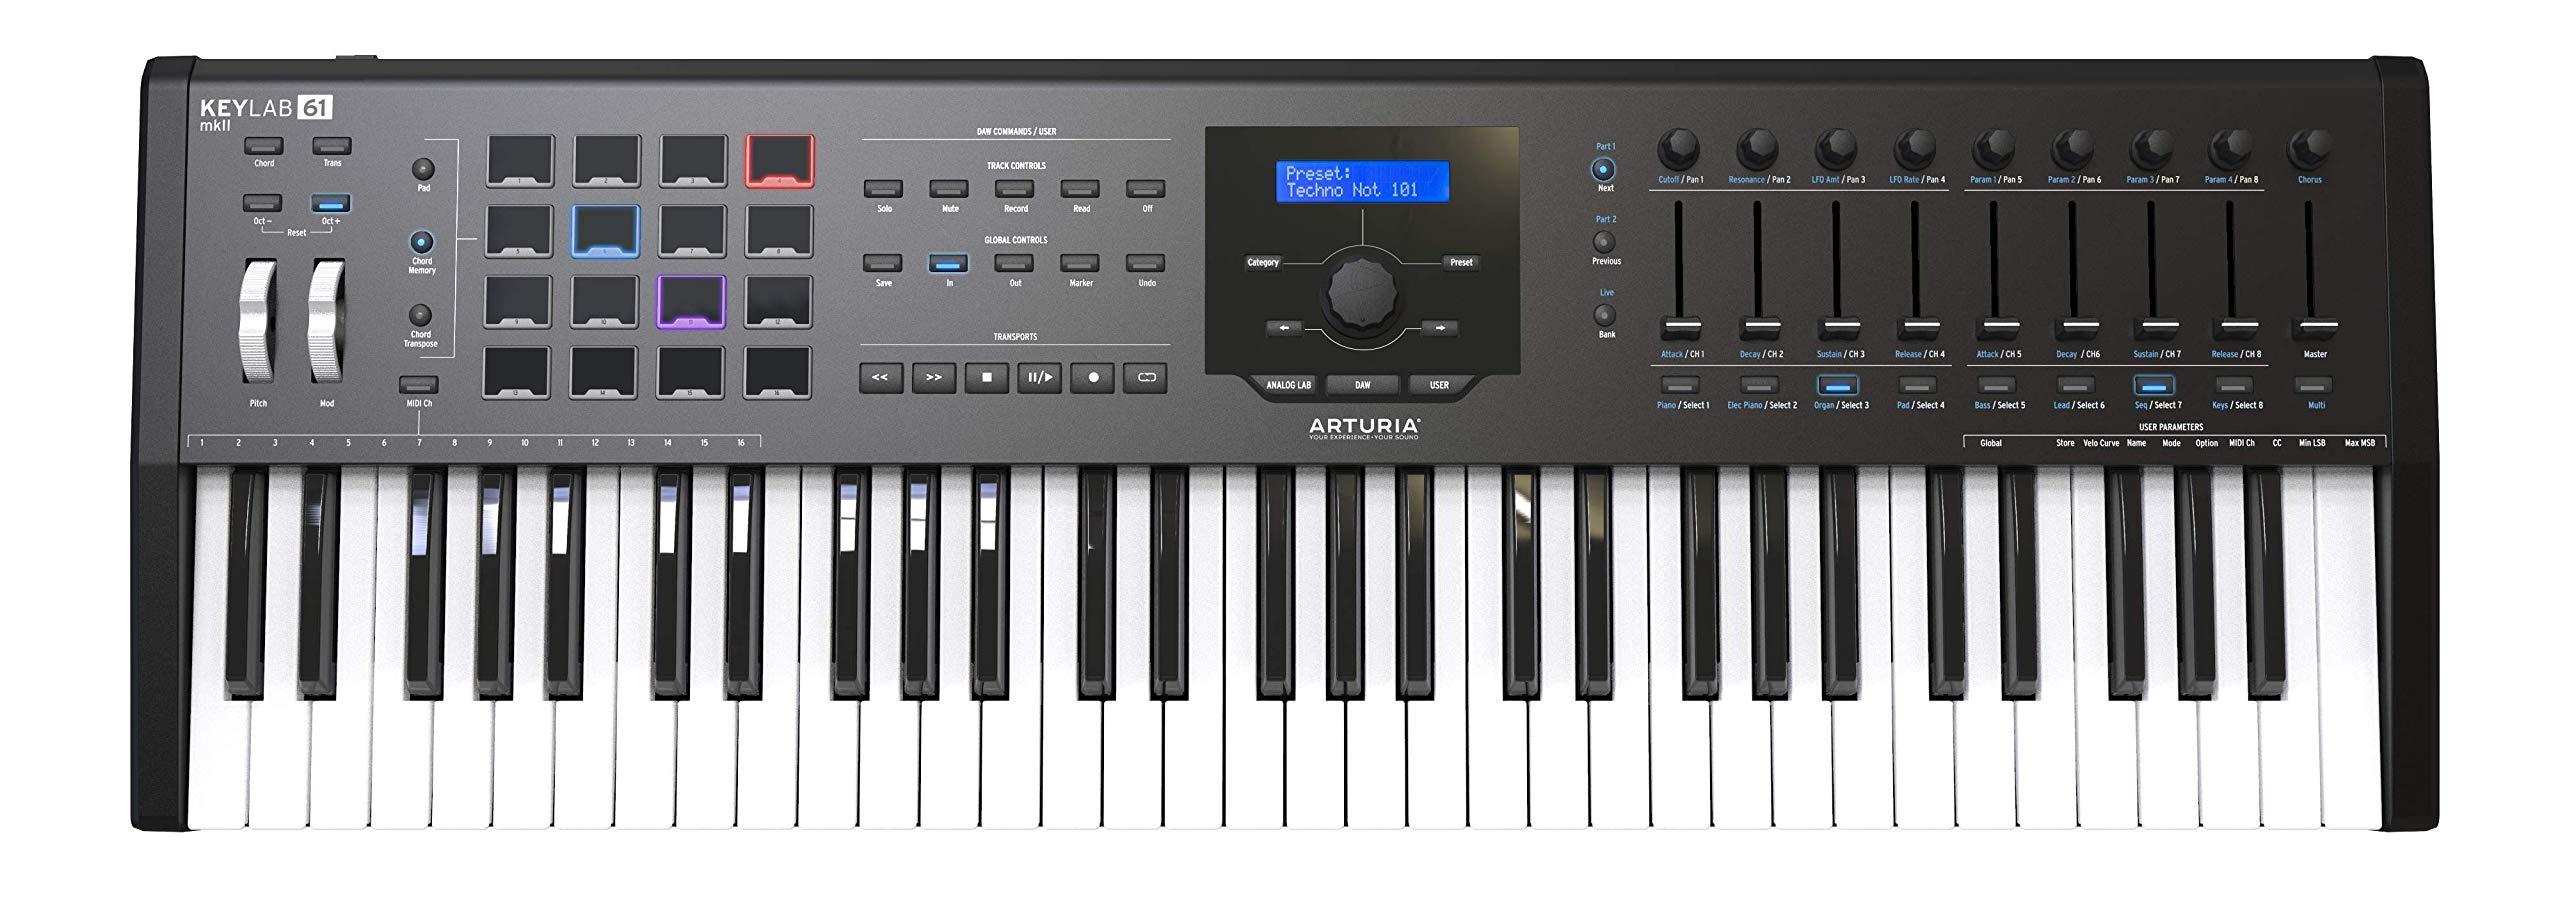 Arturia KeyLab 61 MKII Keyboard Controller (Black) by Arturia (Image #1)